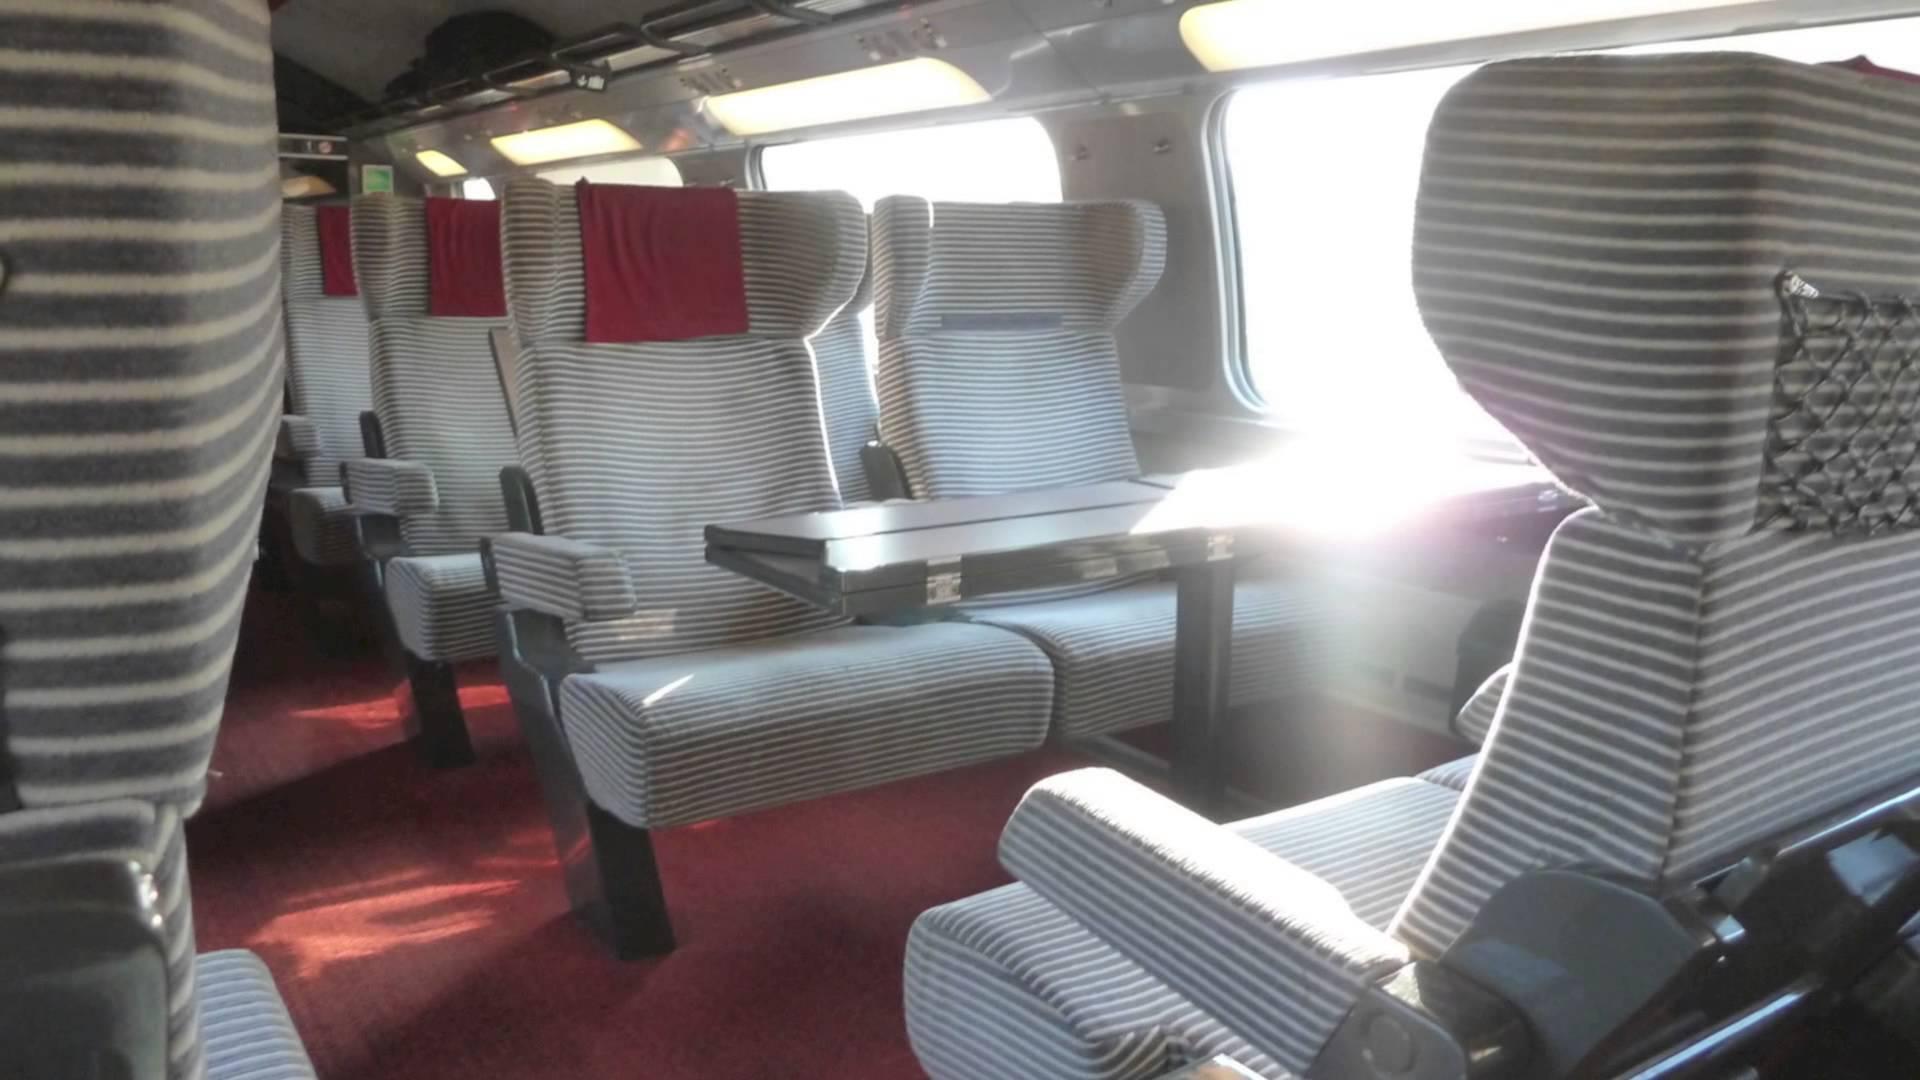 TGV Duplex - Perpignan - Paris - 9th July 2013 - YouTube